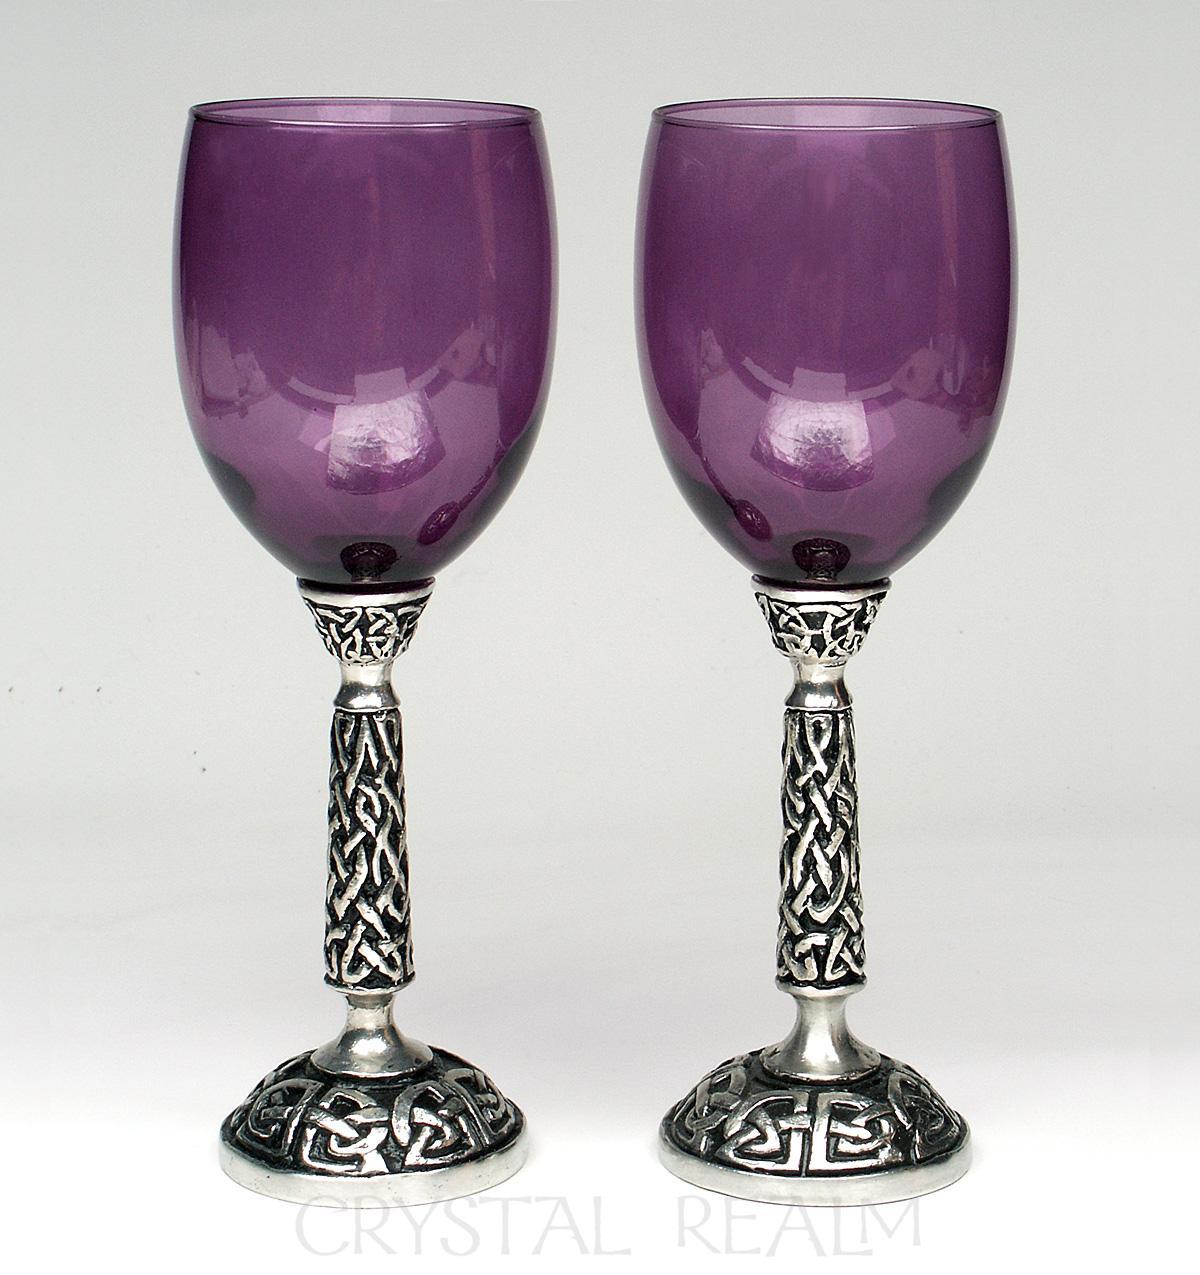 Purple communion goblet or wine glass with Celtic knotwork stem